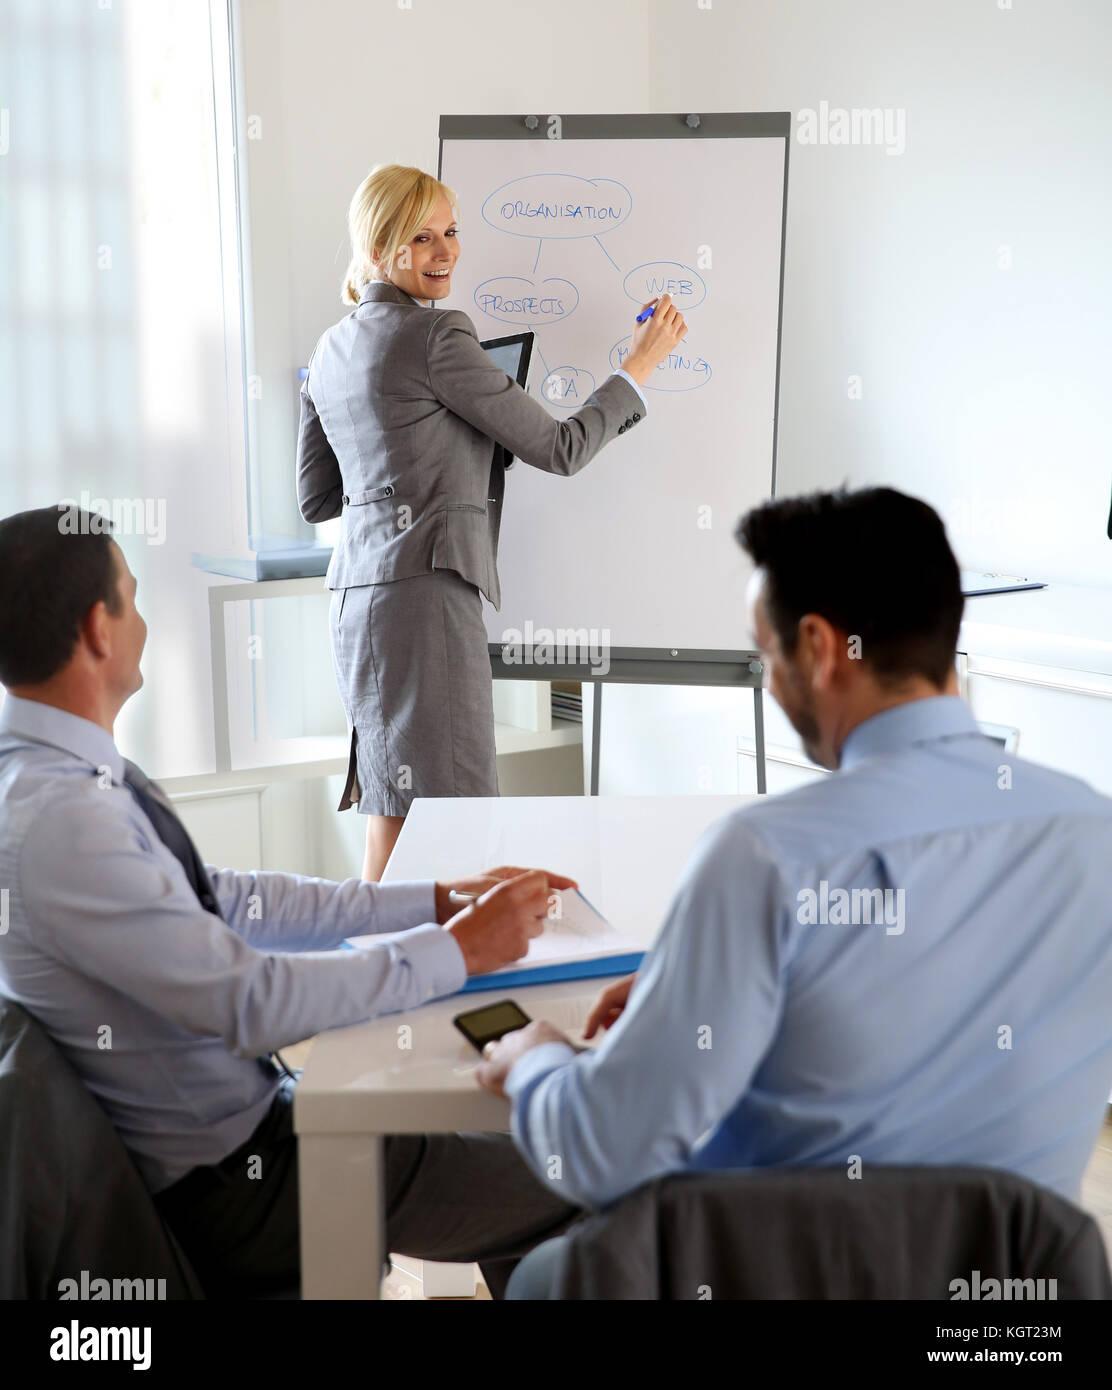 Businesswoman doing business presentation - Stock Image